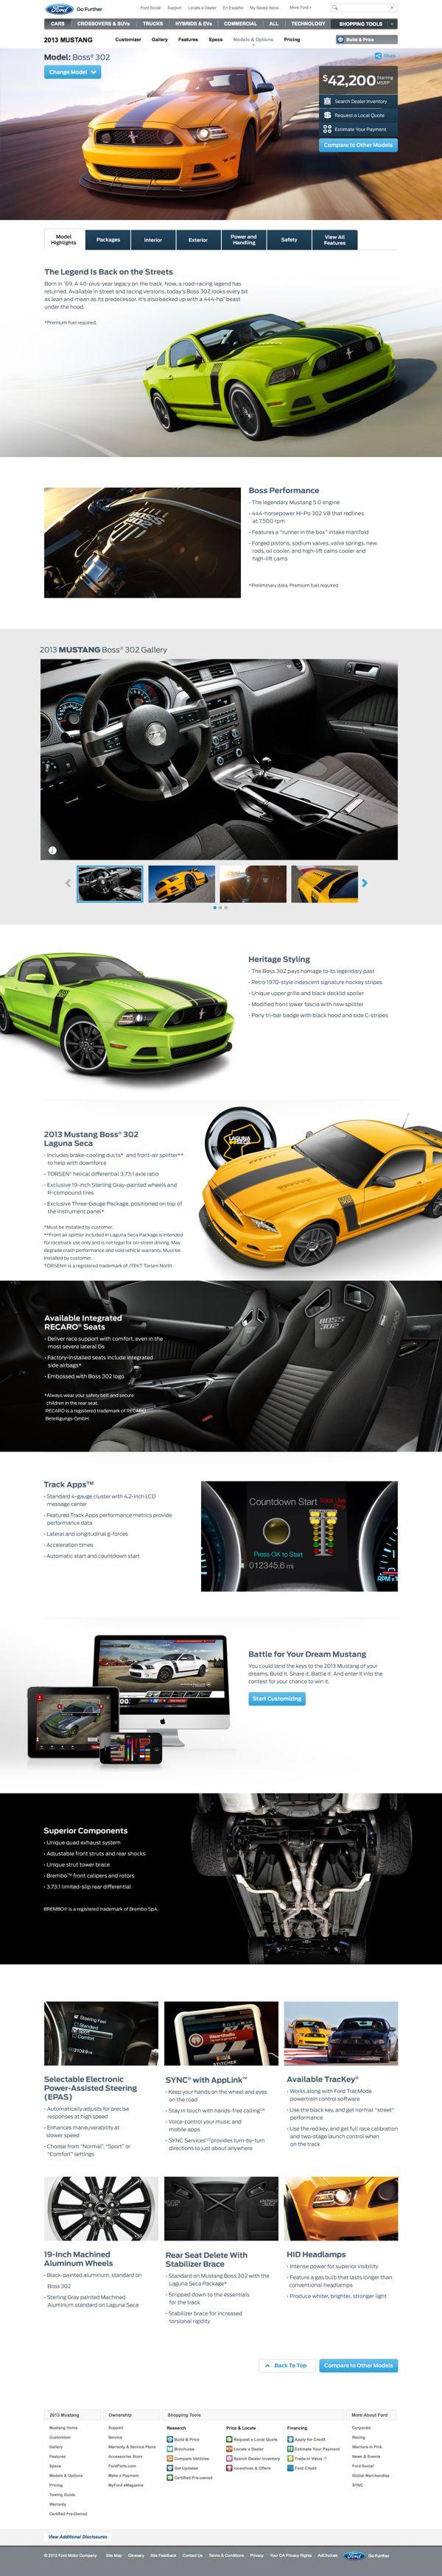 Cool Automotive Web Design on the Internet. Ford. #automotive #webdesign @ http://www.pinterest.com/alfredchong/automotive-web-design/